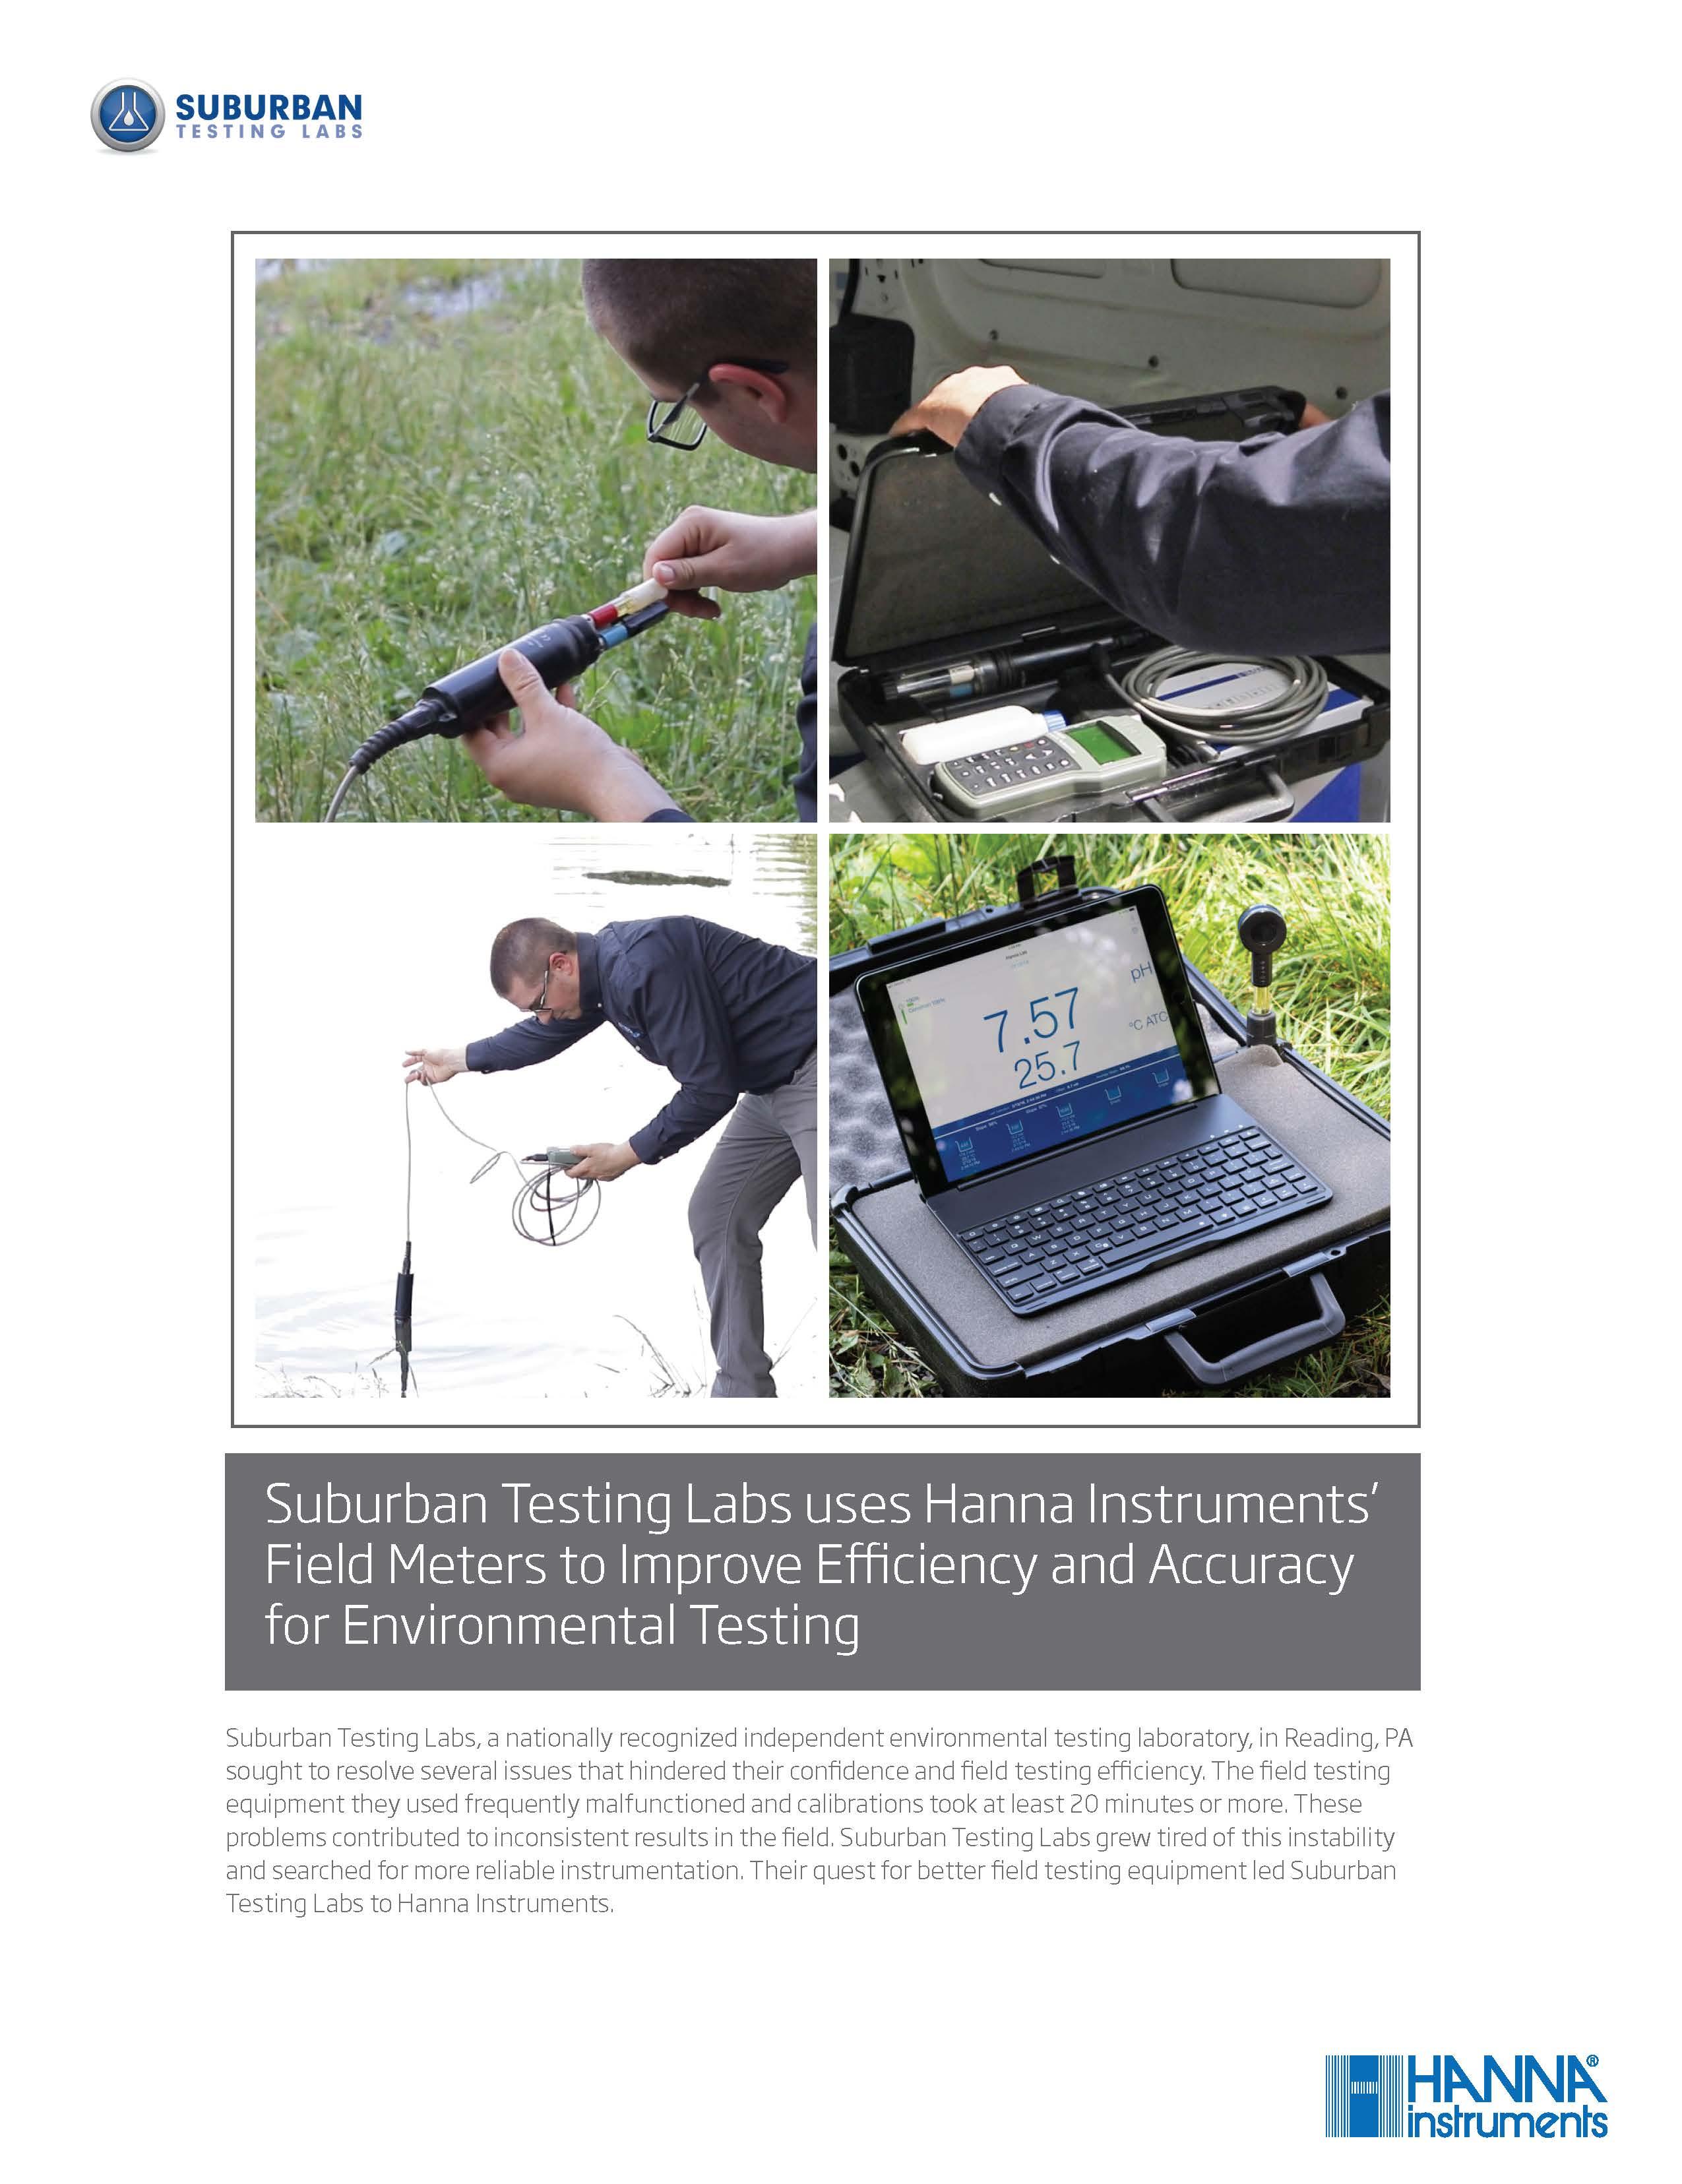 Case-Study-Suburban-Testing-Labs--V1 (2)